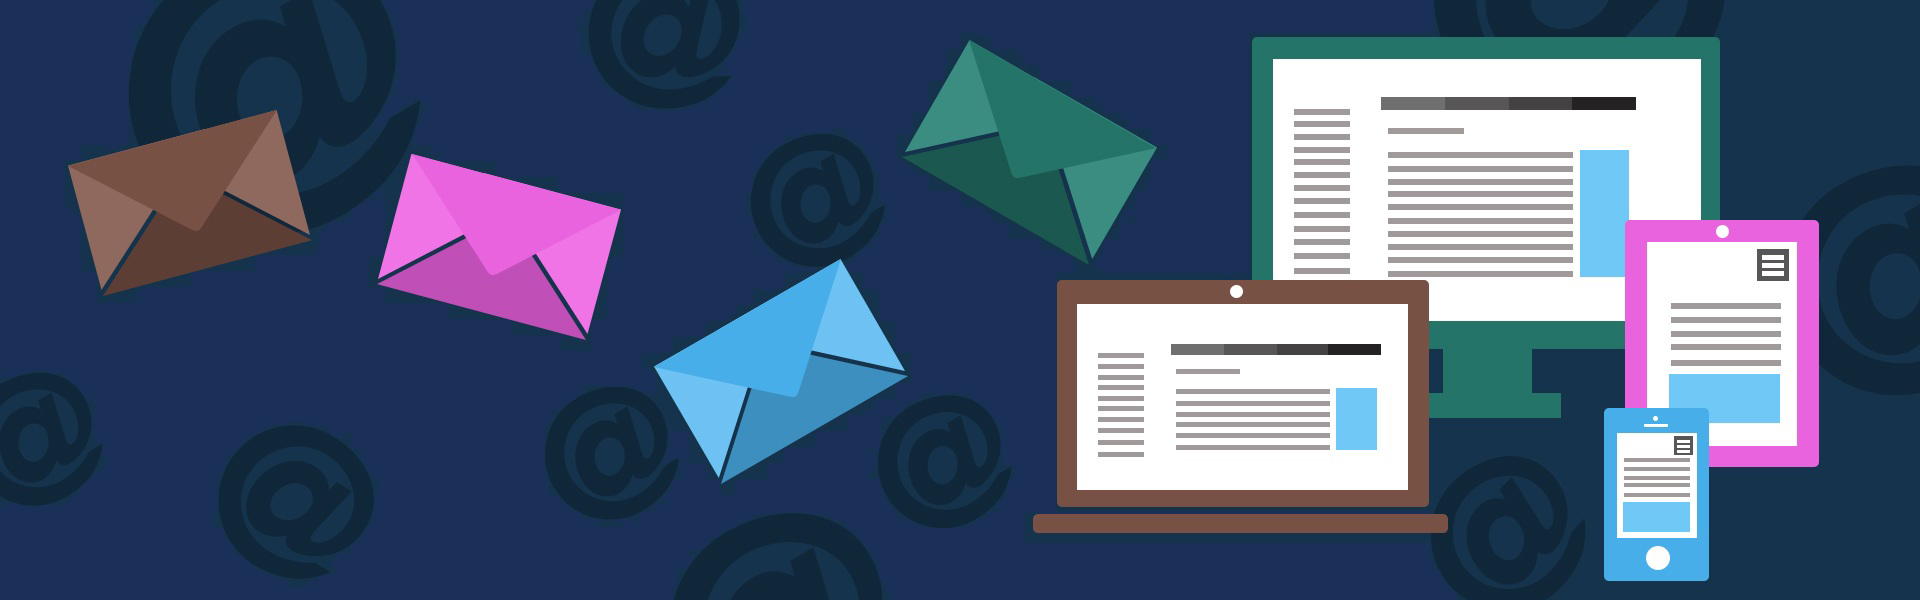 e-mail-marketing-27452161